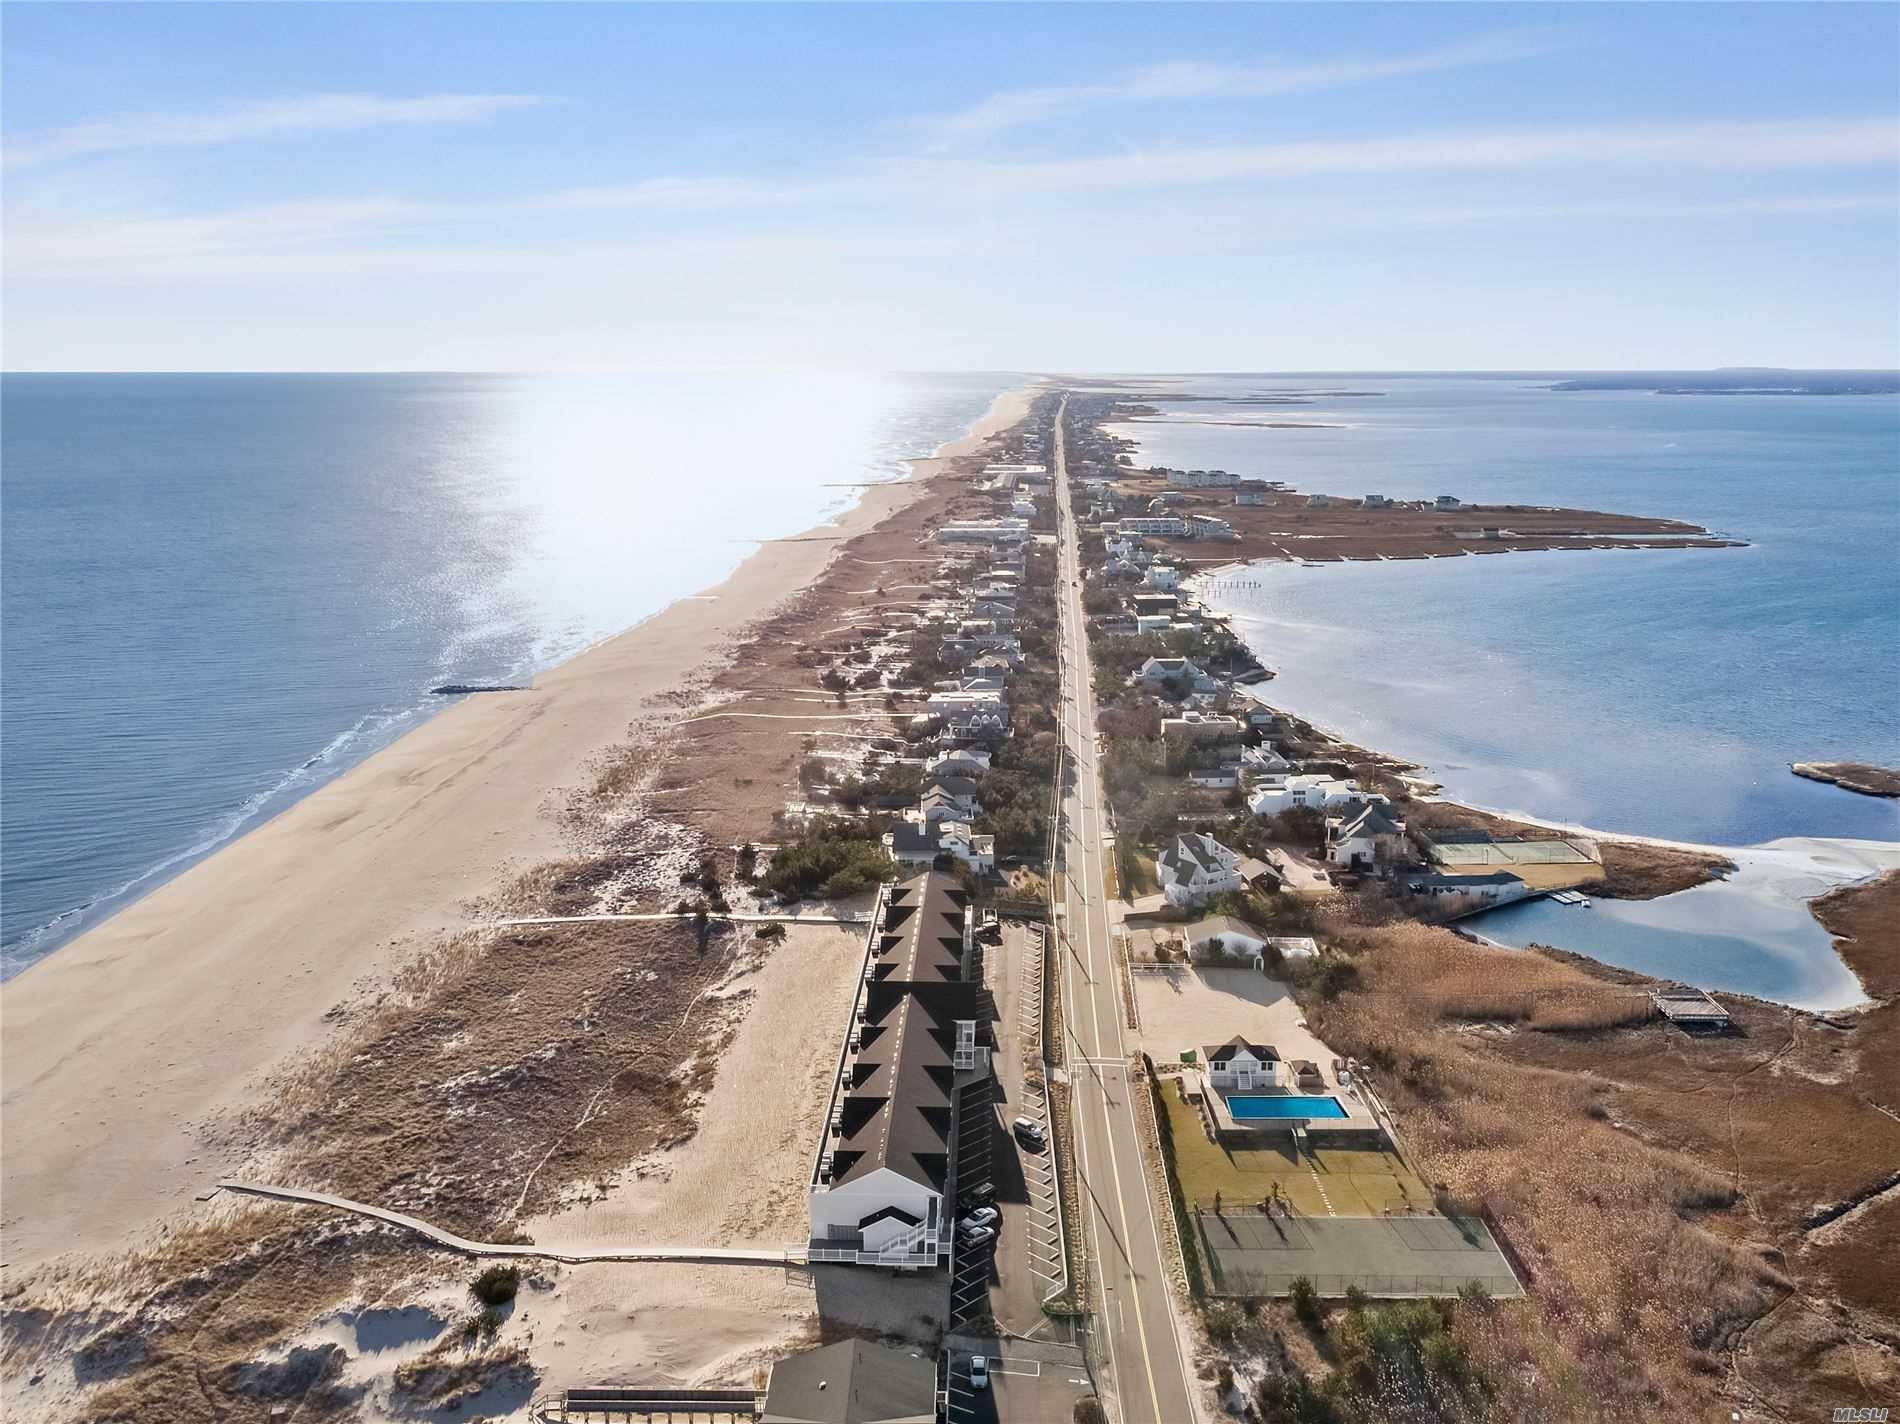 473 Dune Rd - Westhampton Beach, New York